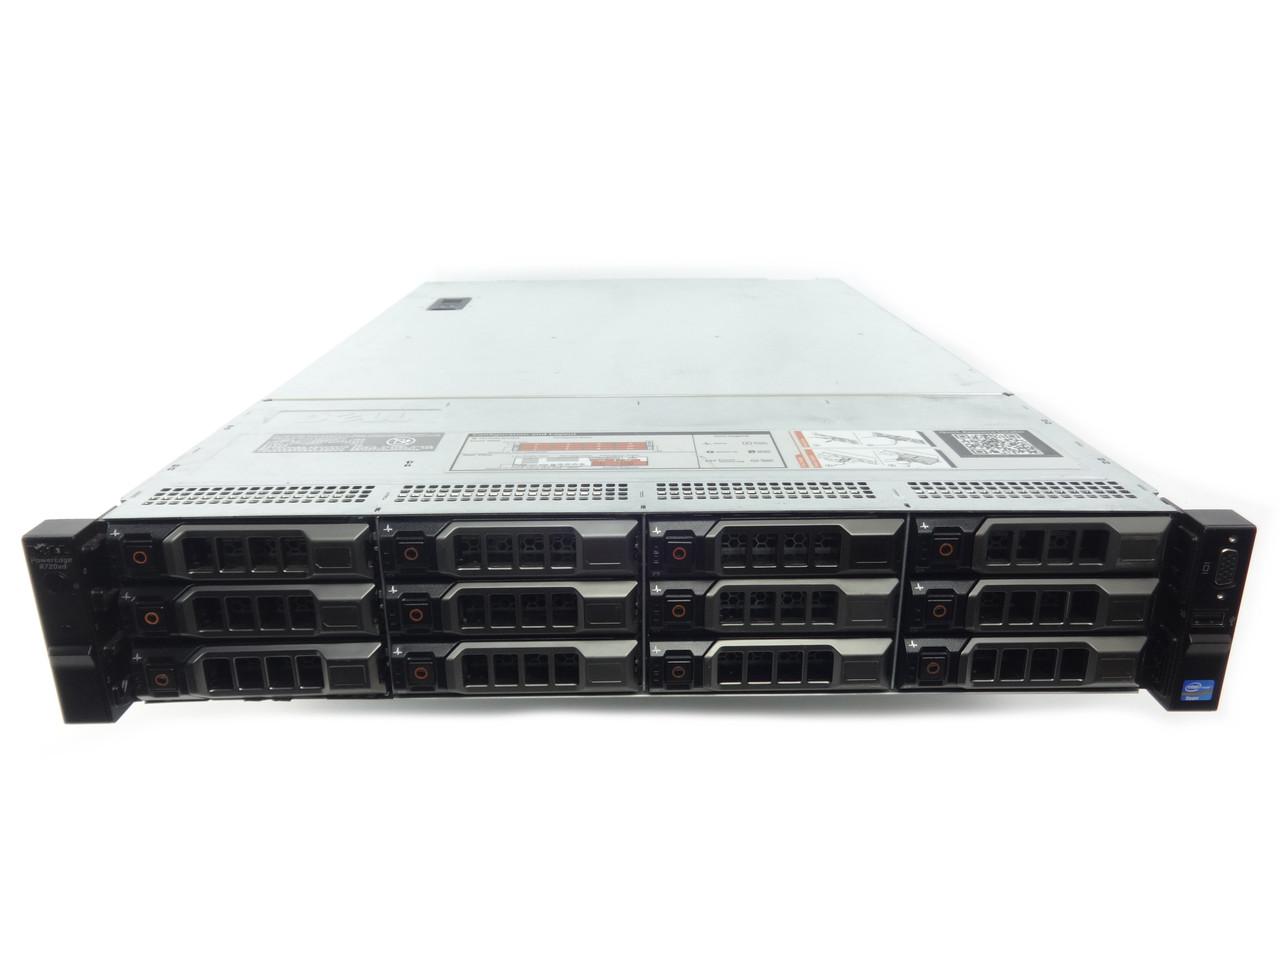 Used Dell Poweredge R720XD LFF Server